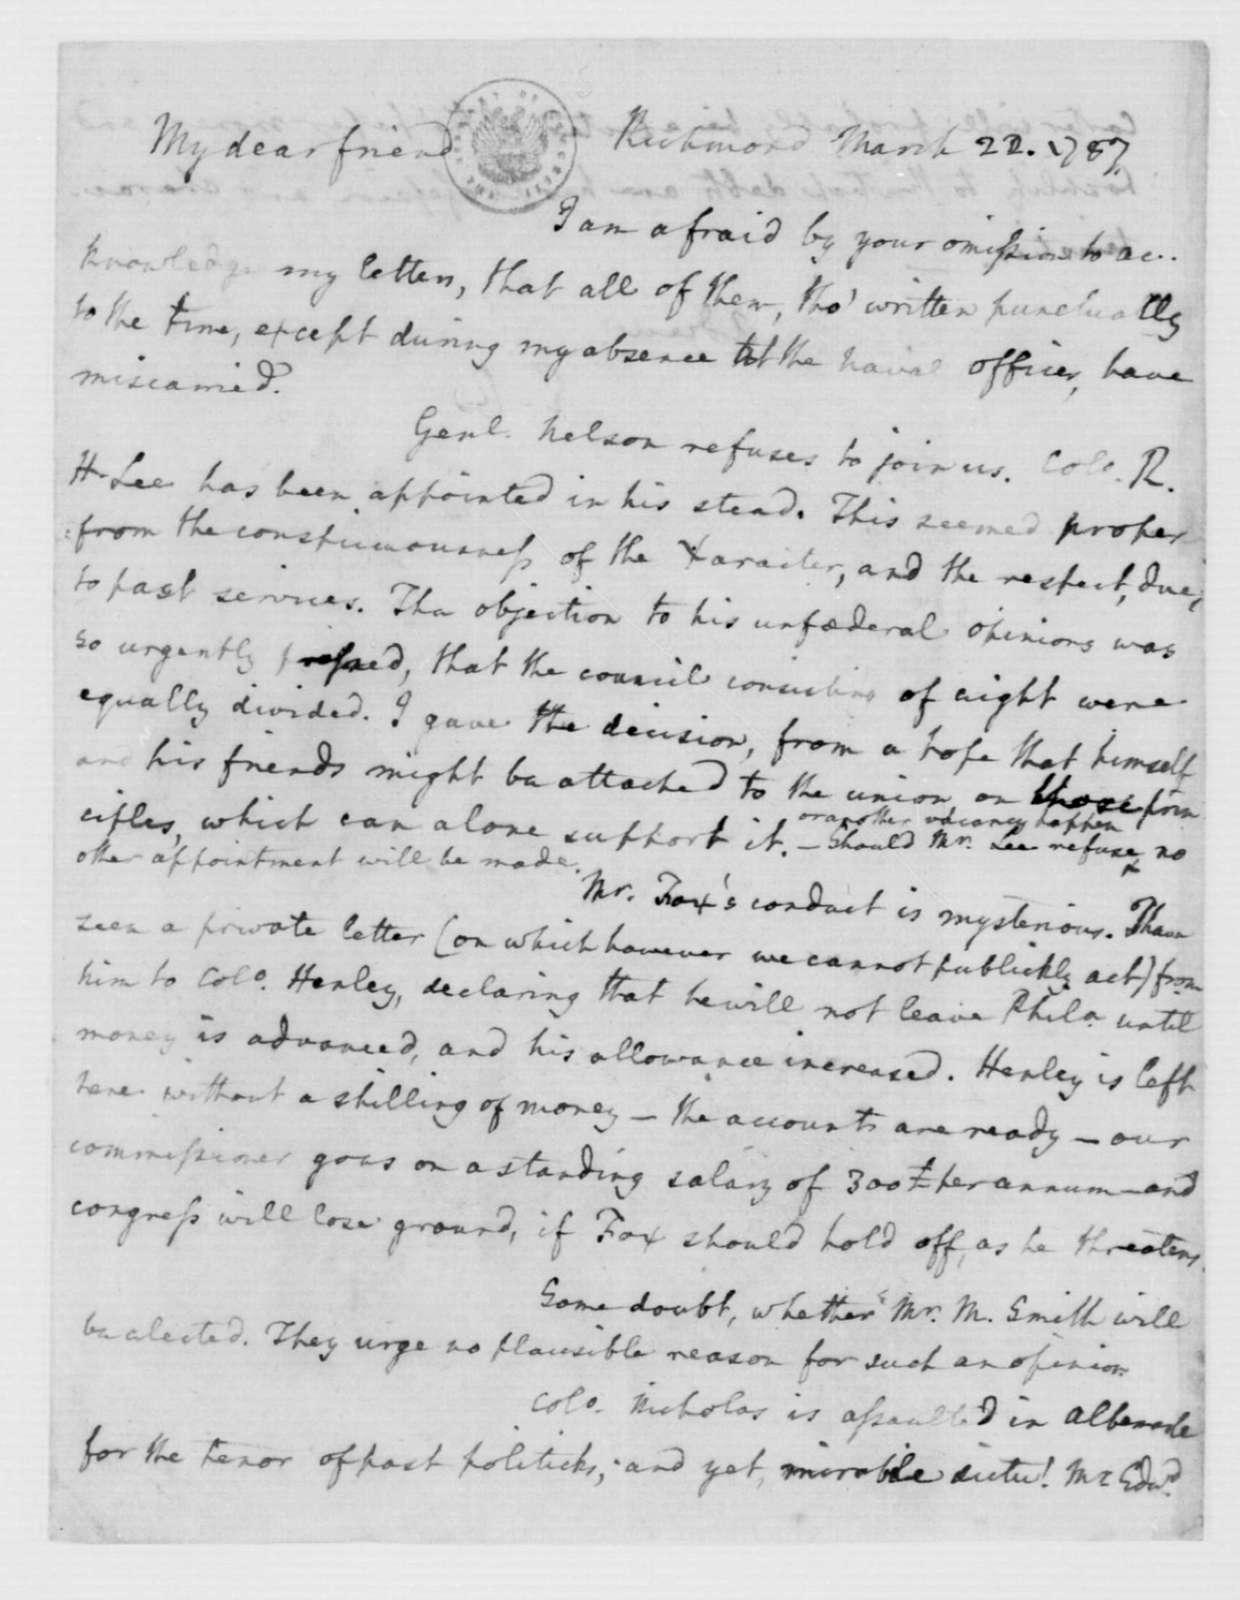 Edmund Randolph to James Madison, March 22, 1787.